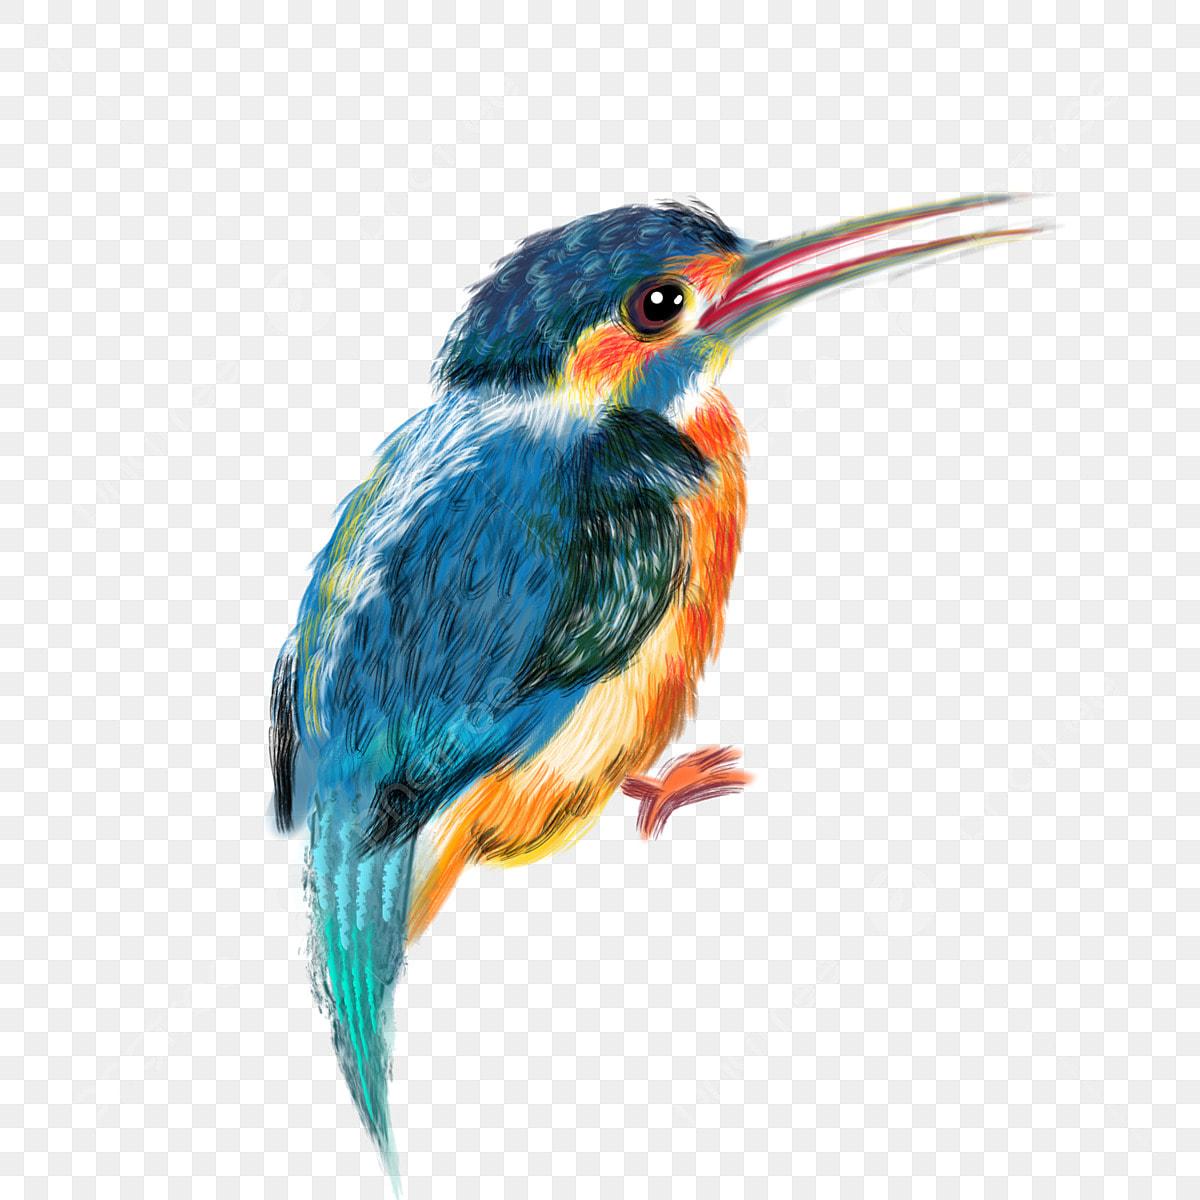 Plumas De Colores Hermosas Aves Dibujos Animados Elemento